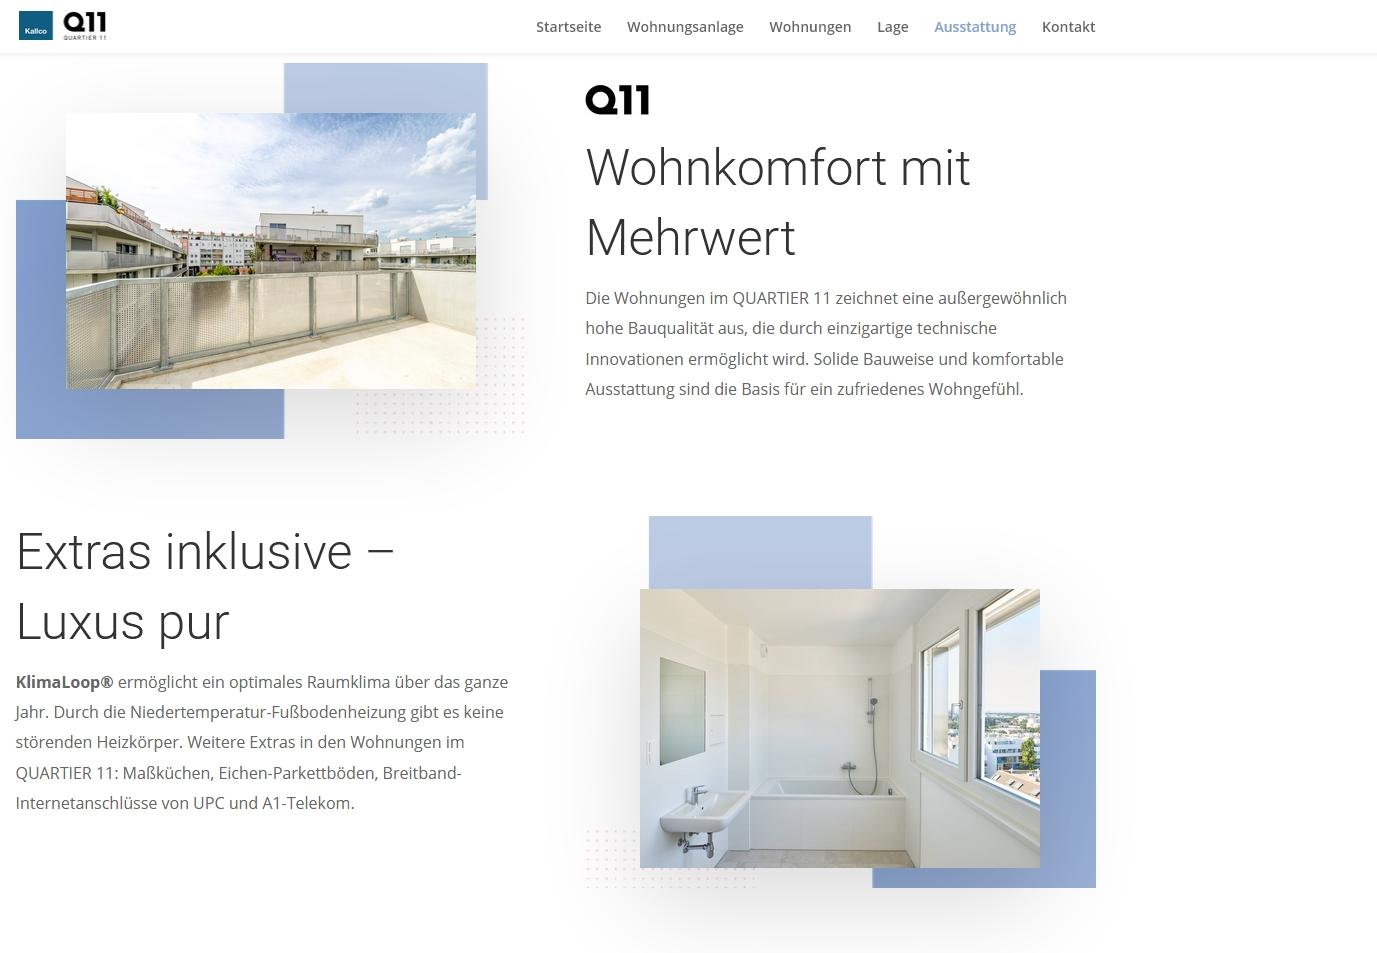 Wohnbauprojekt Q11